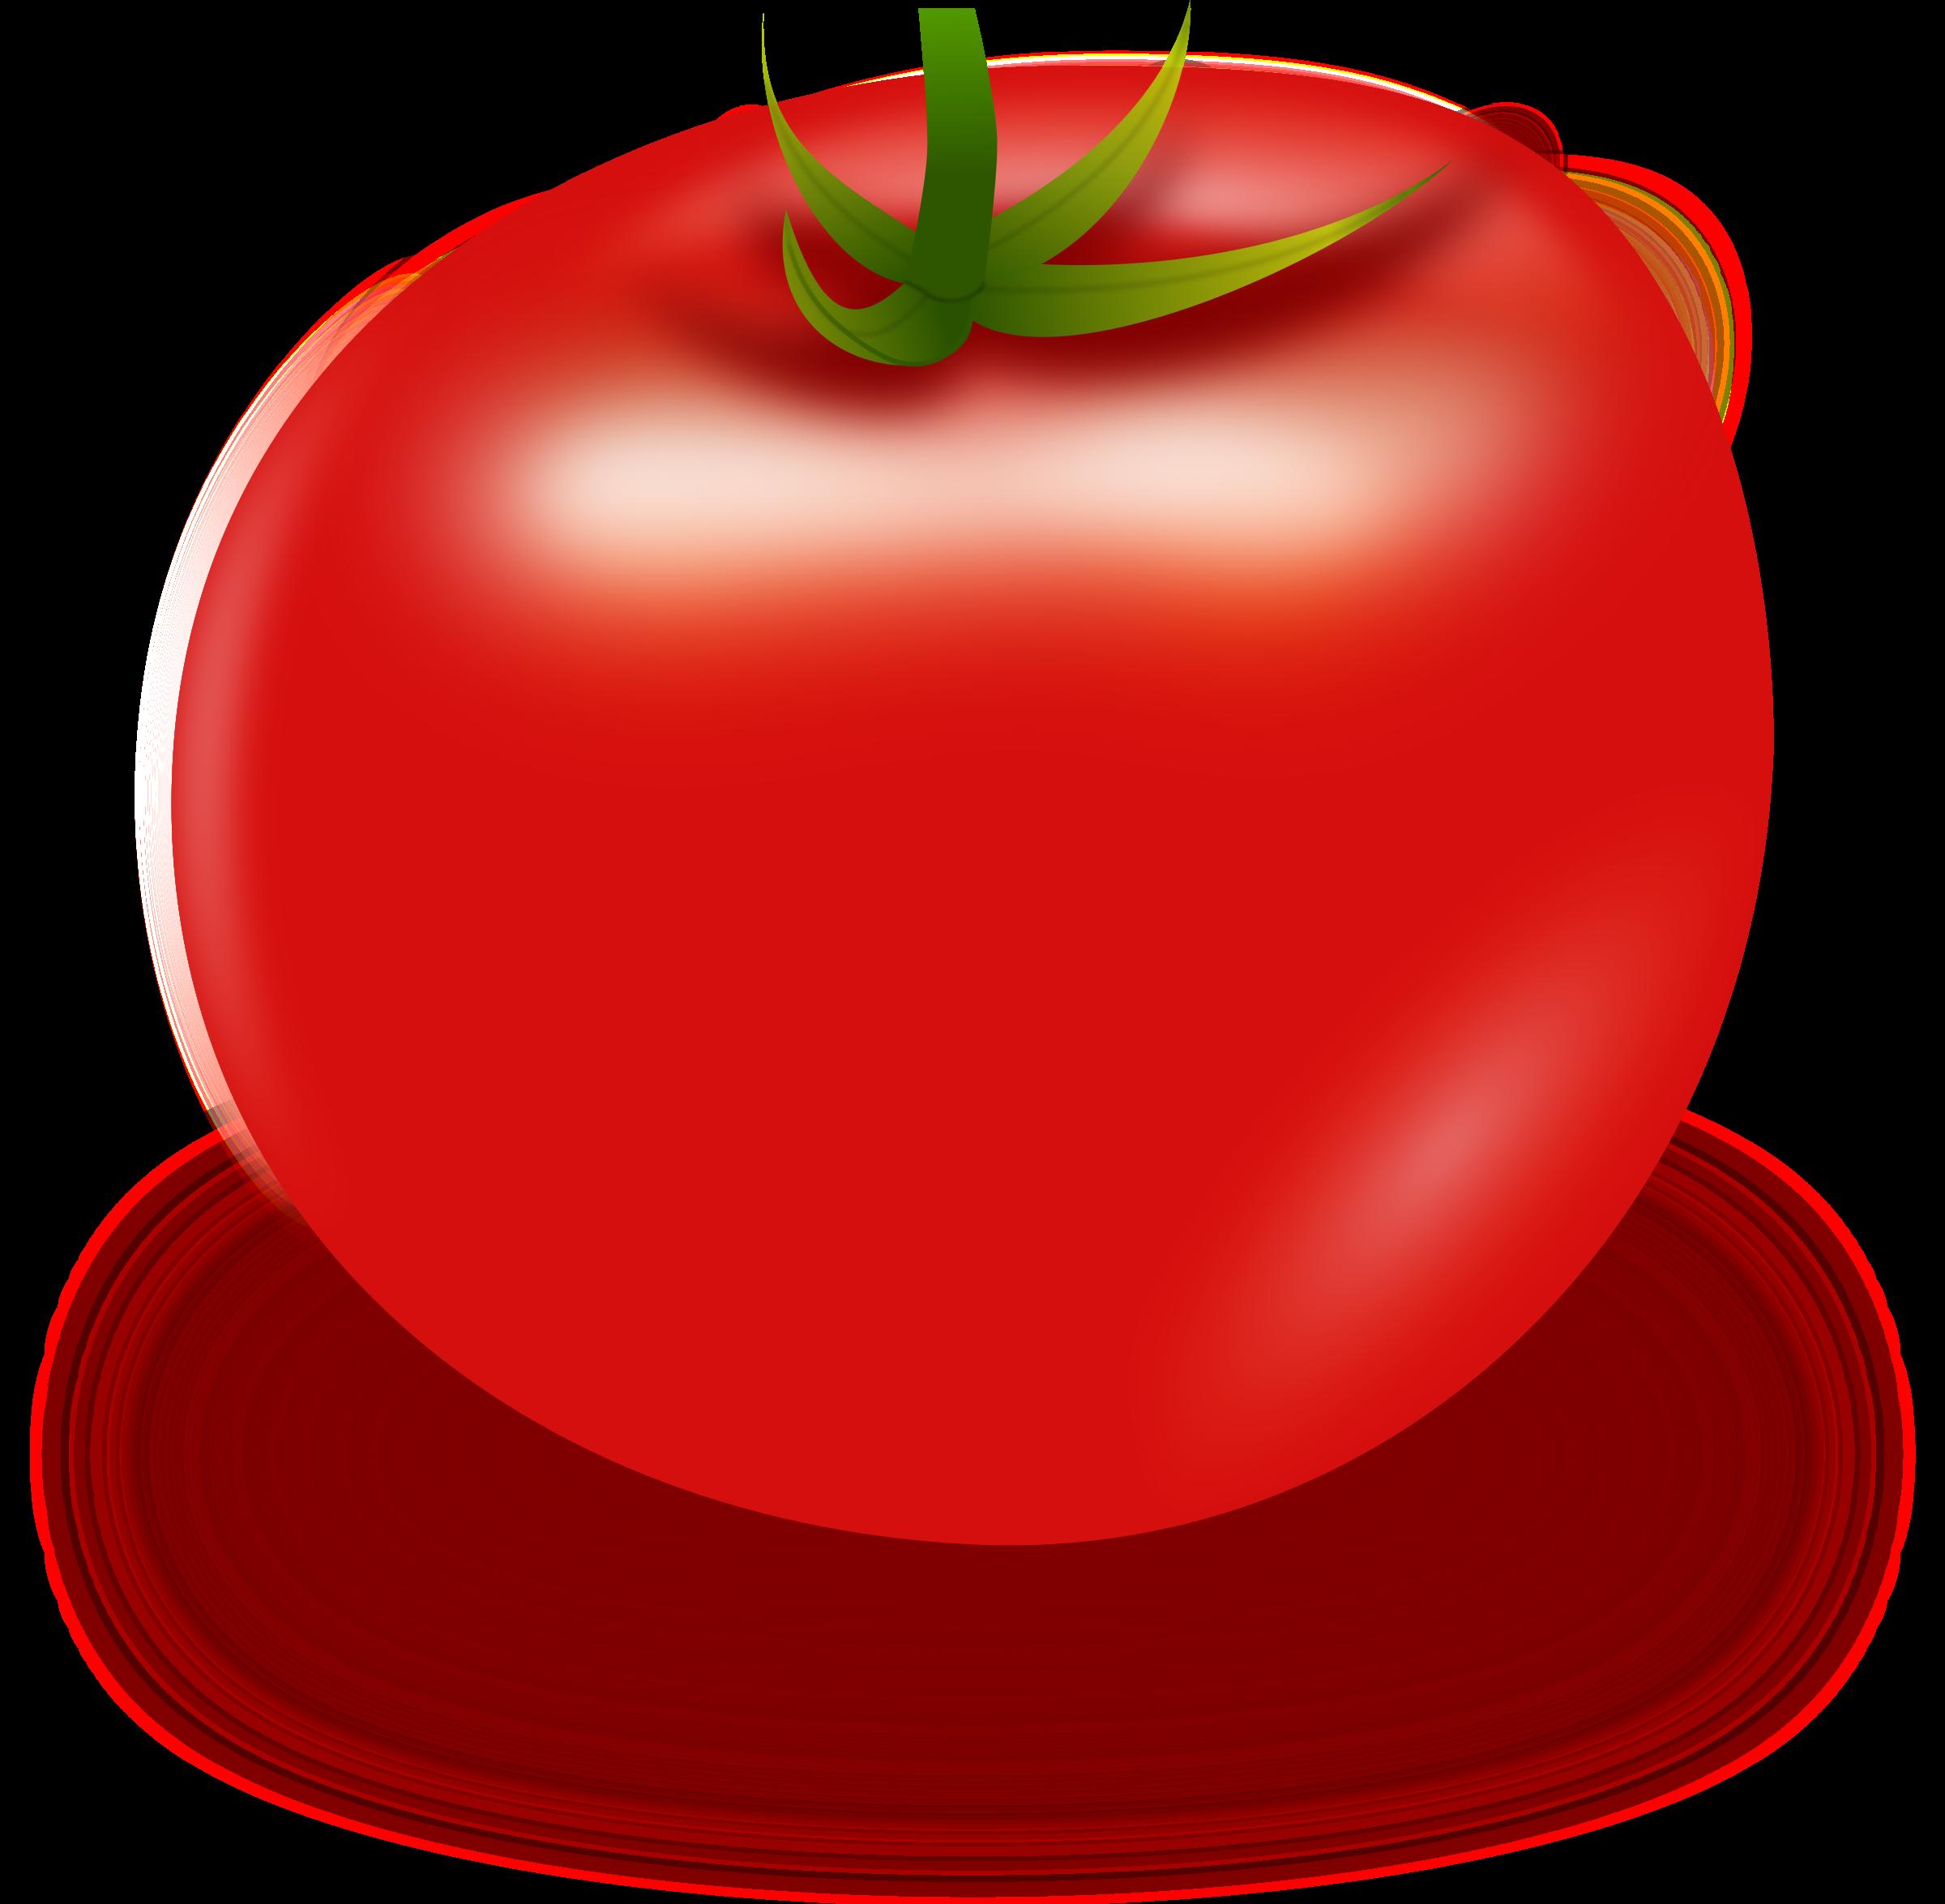 Tomatoe clipart - Clipground